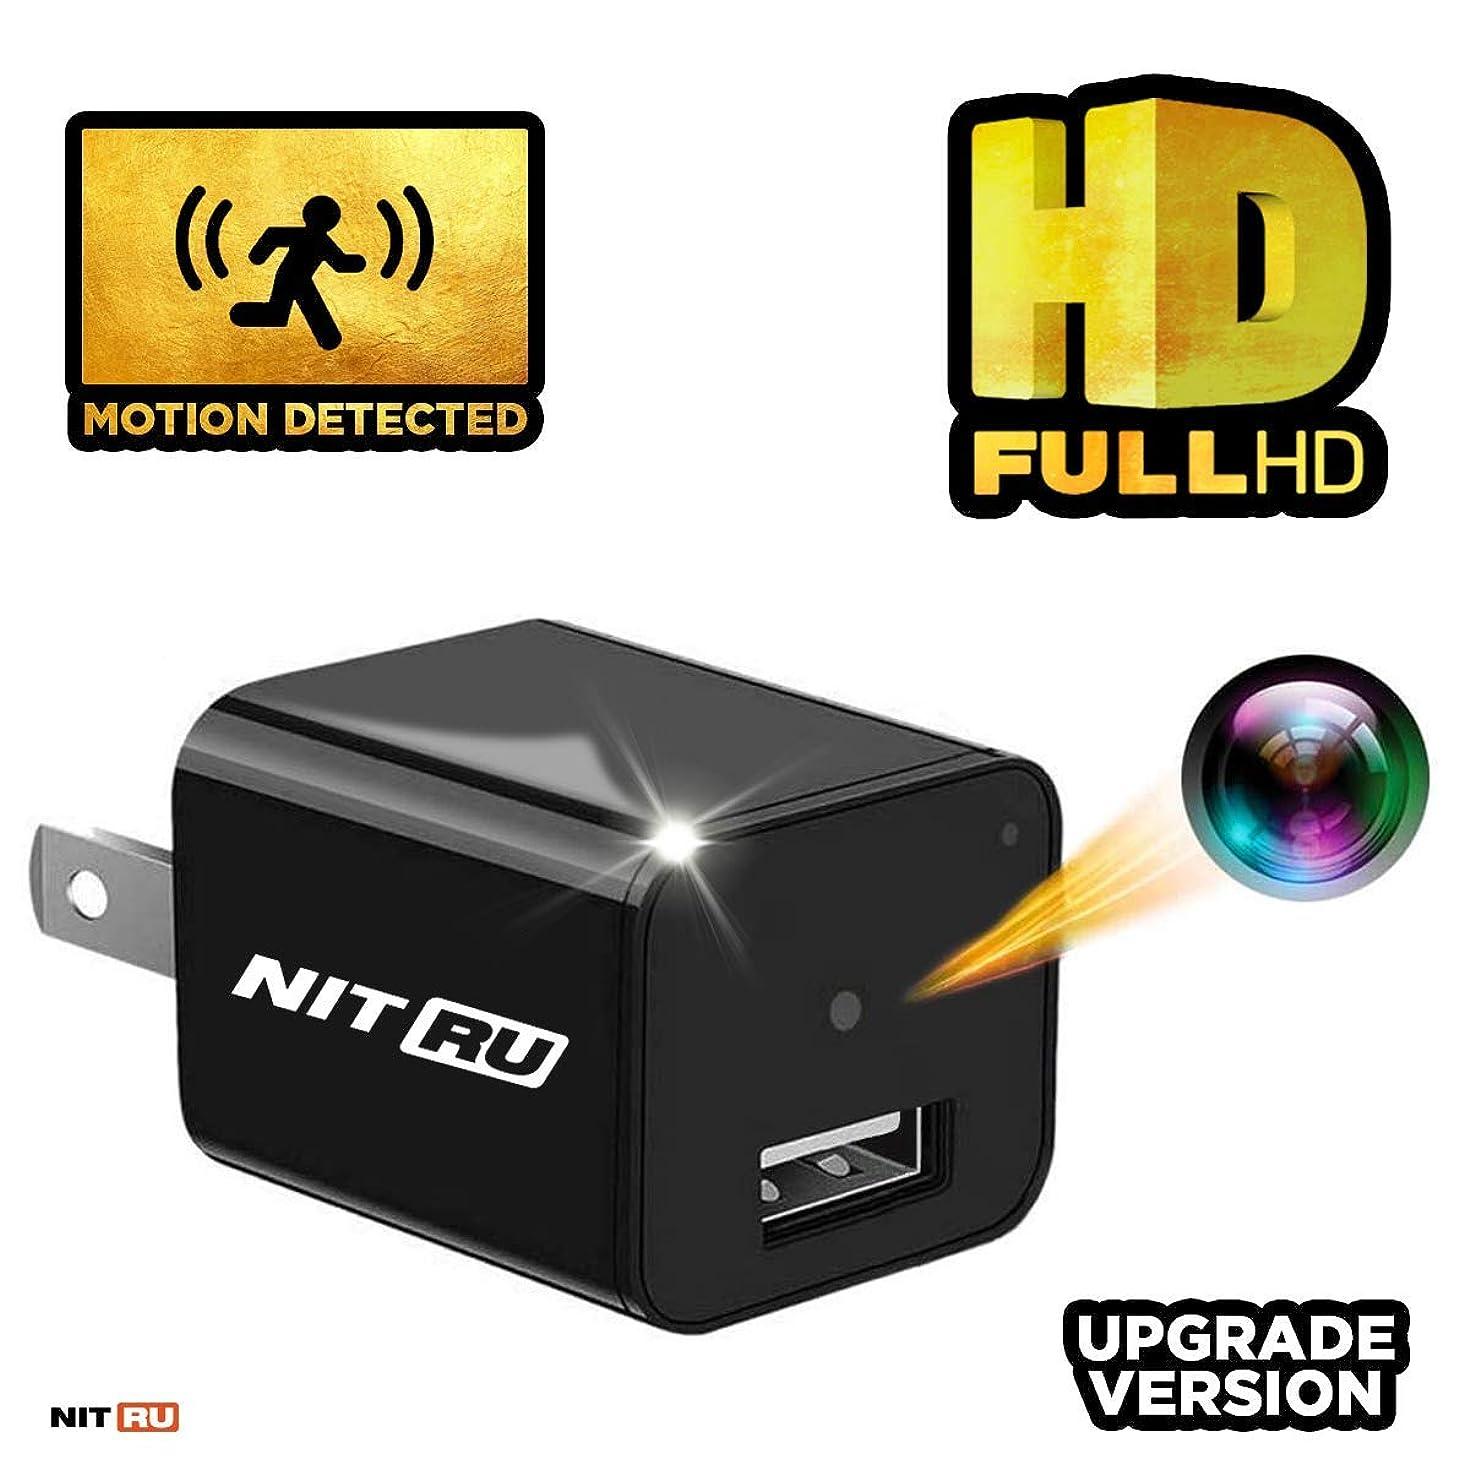 Spy Camera Charger - Spy Camera - Motion Detection - Hidden Camera - Surveillance Camera - Mini spy Camera -USB Camera - Spy Camera Charger - Hidden Camera Charger - Security Camera